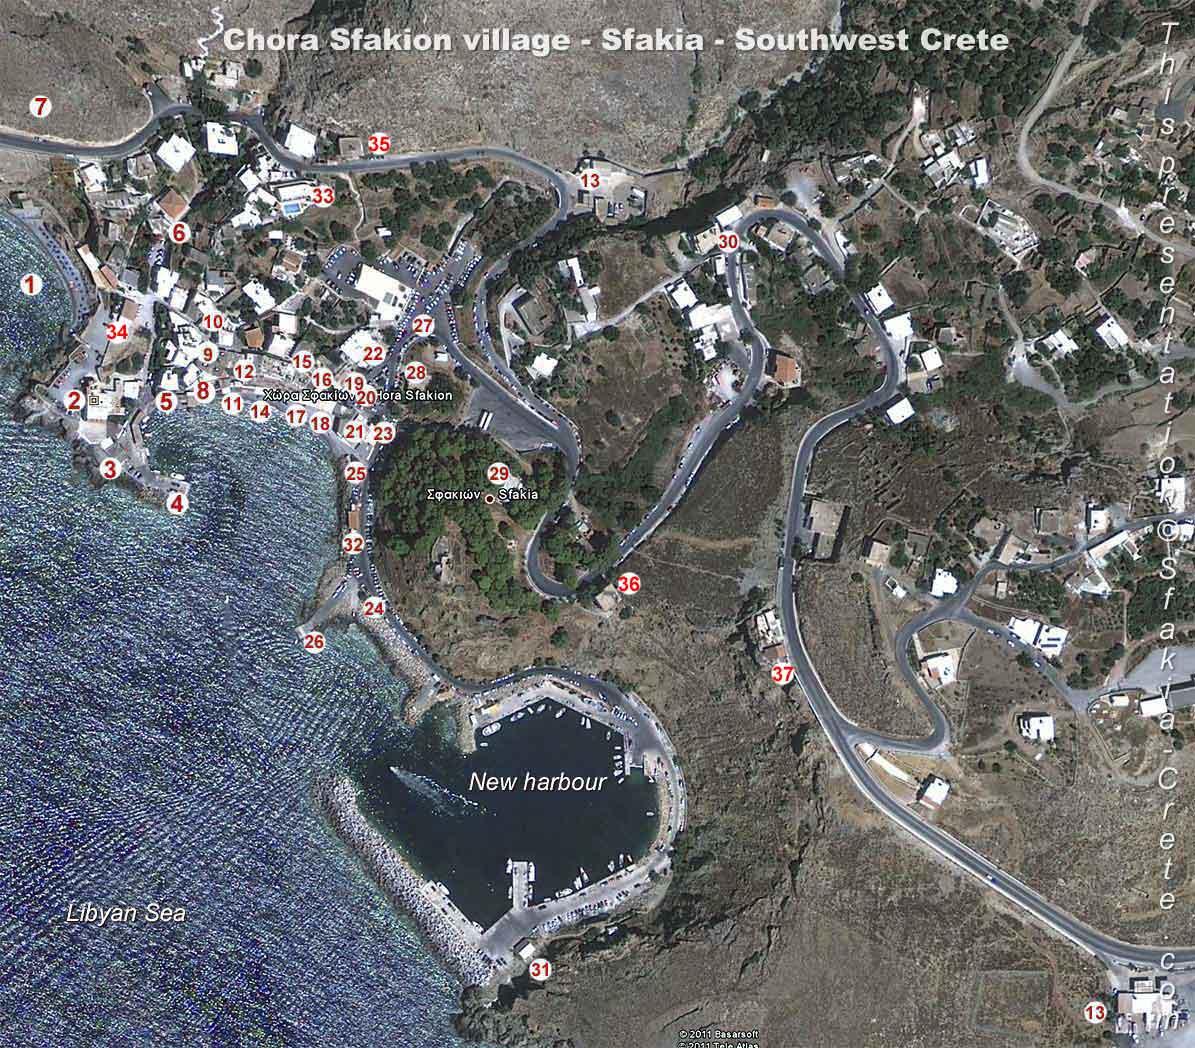 Map Of Chora Sfakion - Sfakia  Southwest Crete